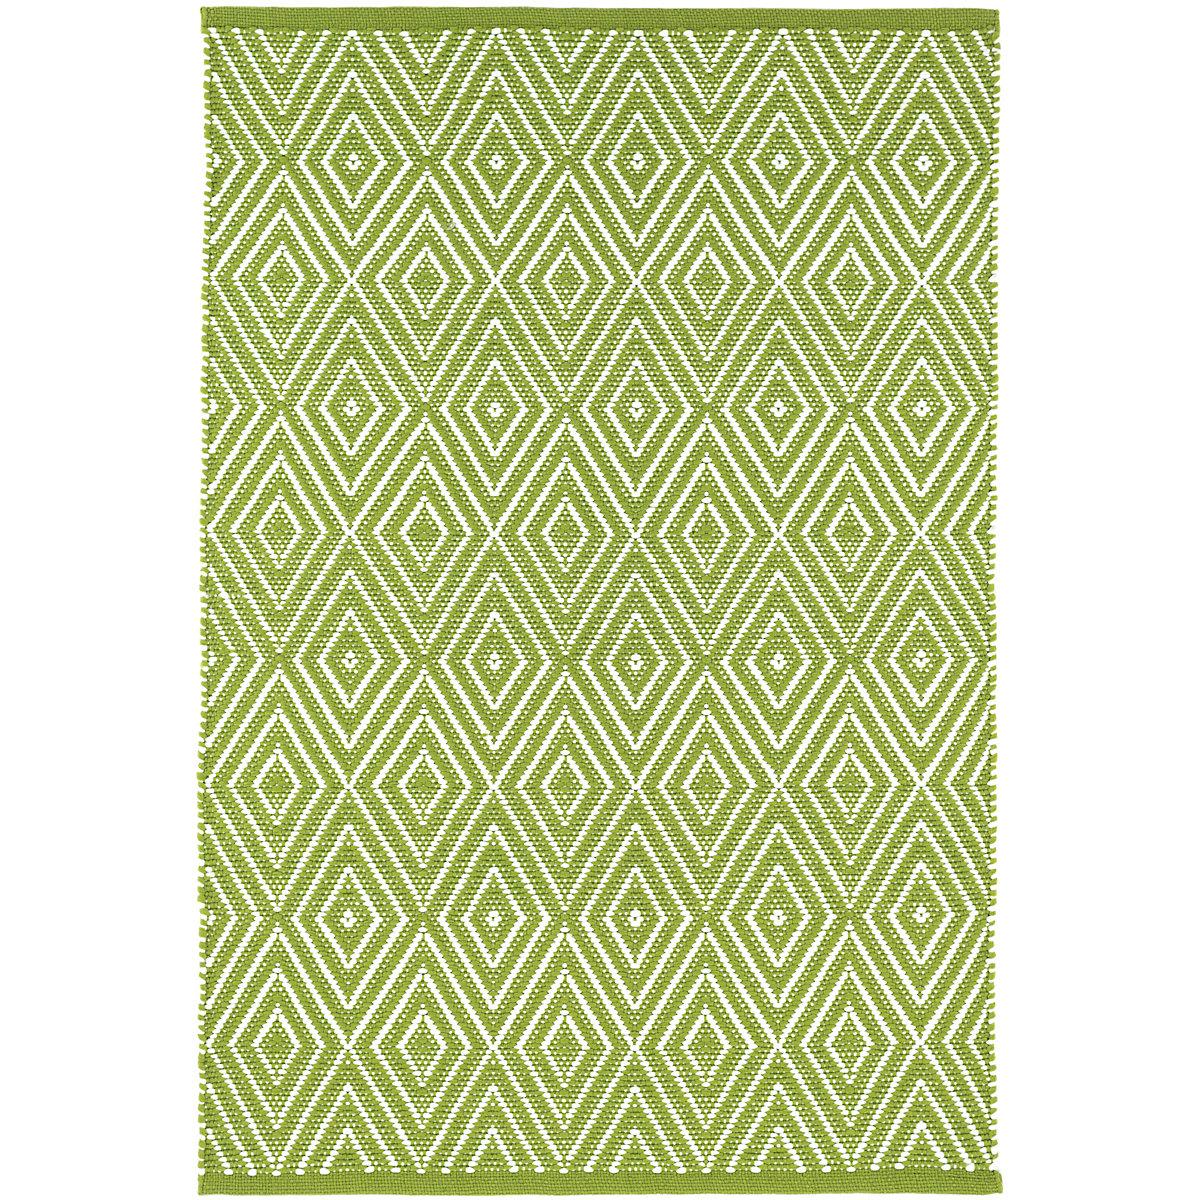 Diamond Sprout/White Indoor/Outdoor Rug | Dash & Albert